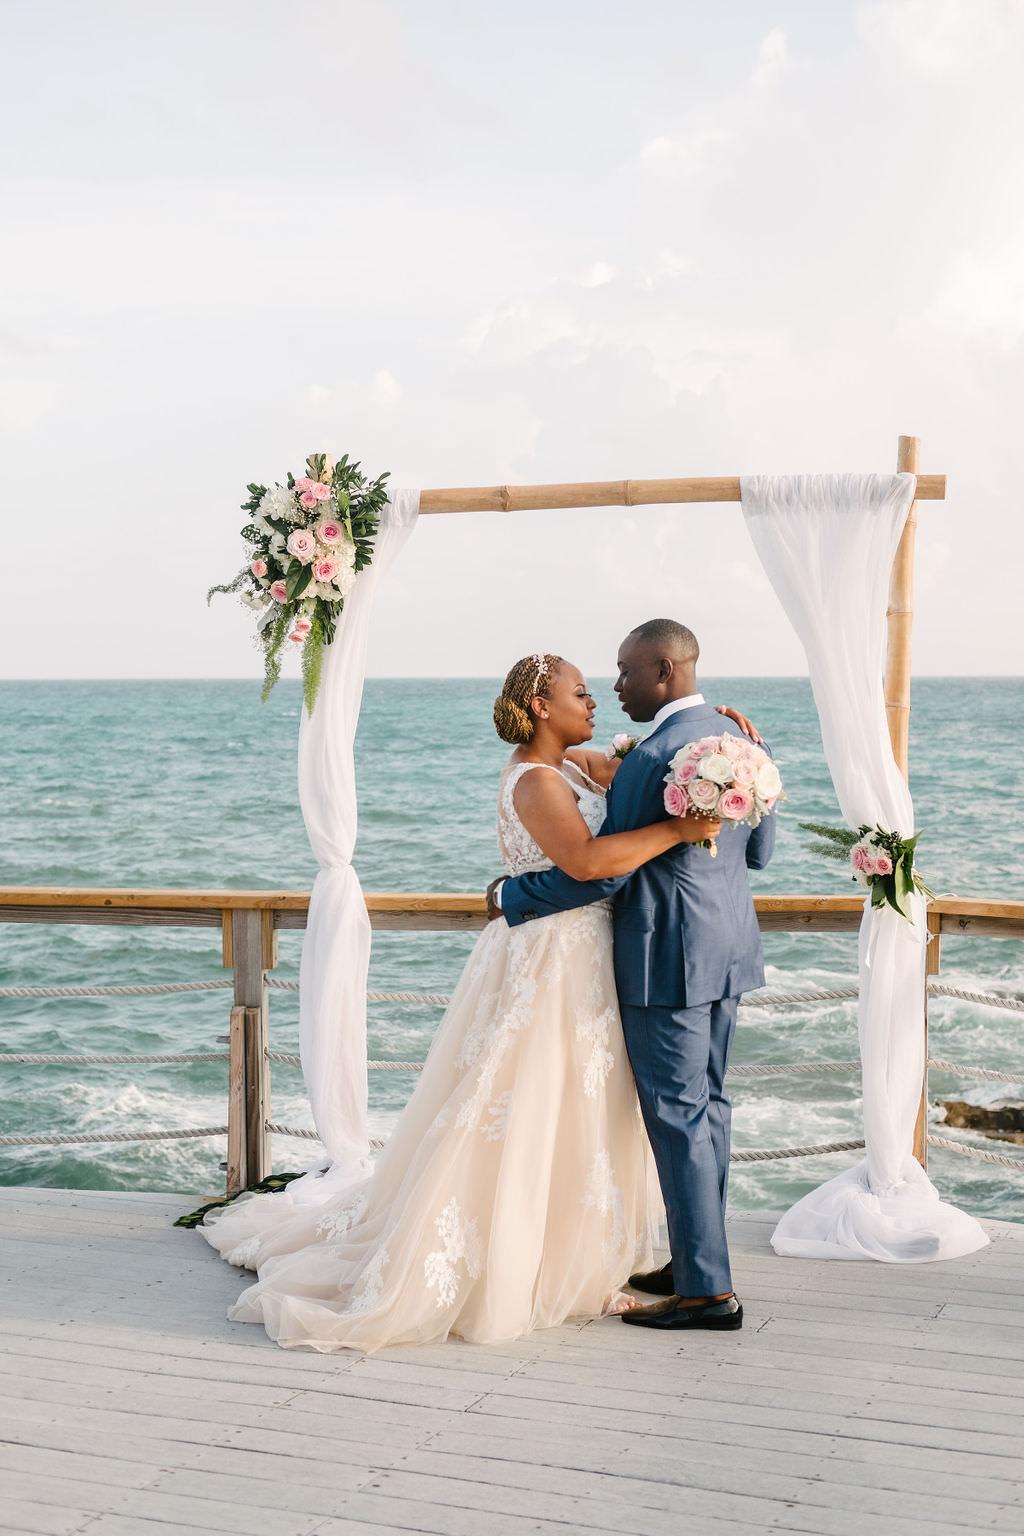 Bermuda Wedding Helen Abraham Photography Flower Arch Drapes Fabric Backdrop Ceremony